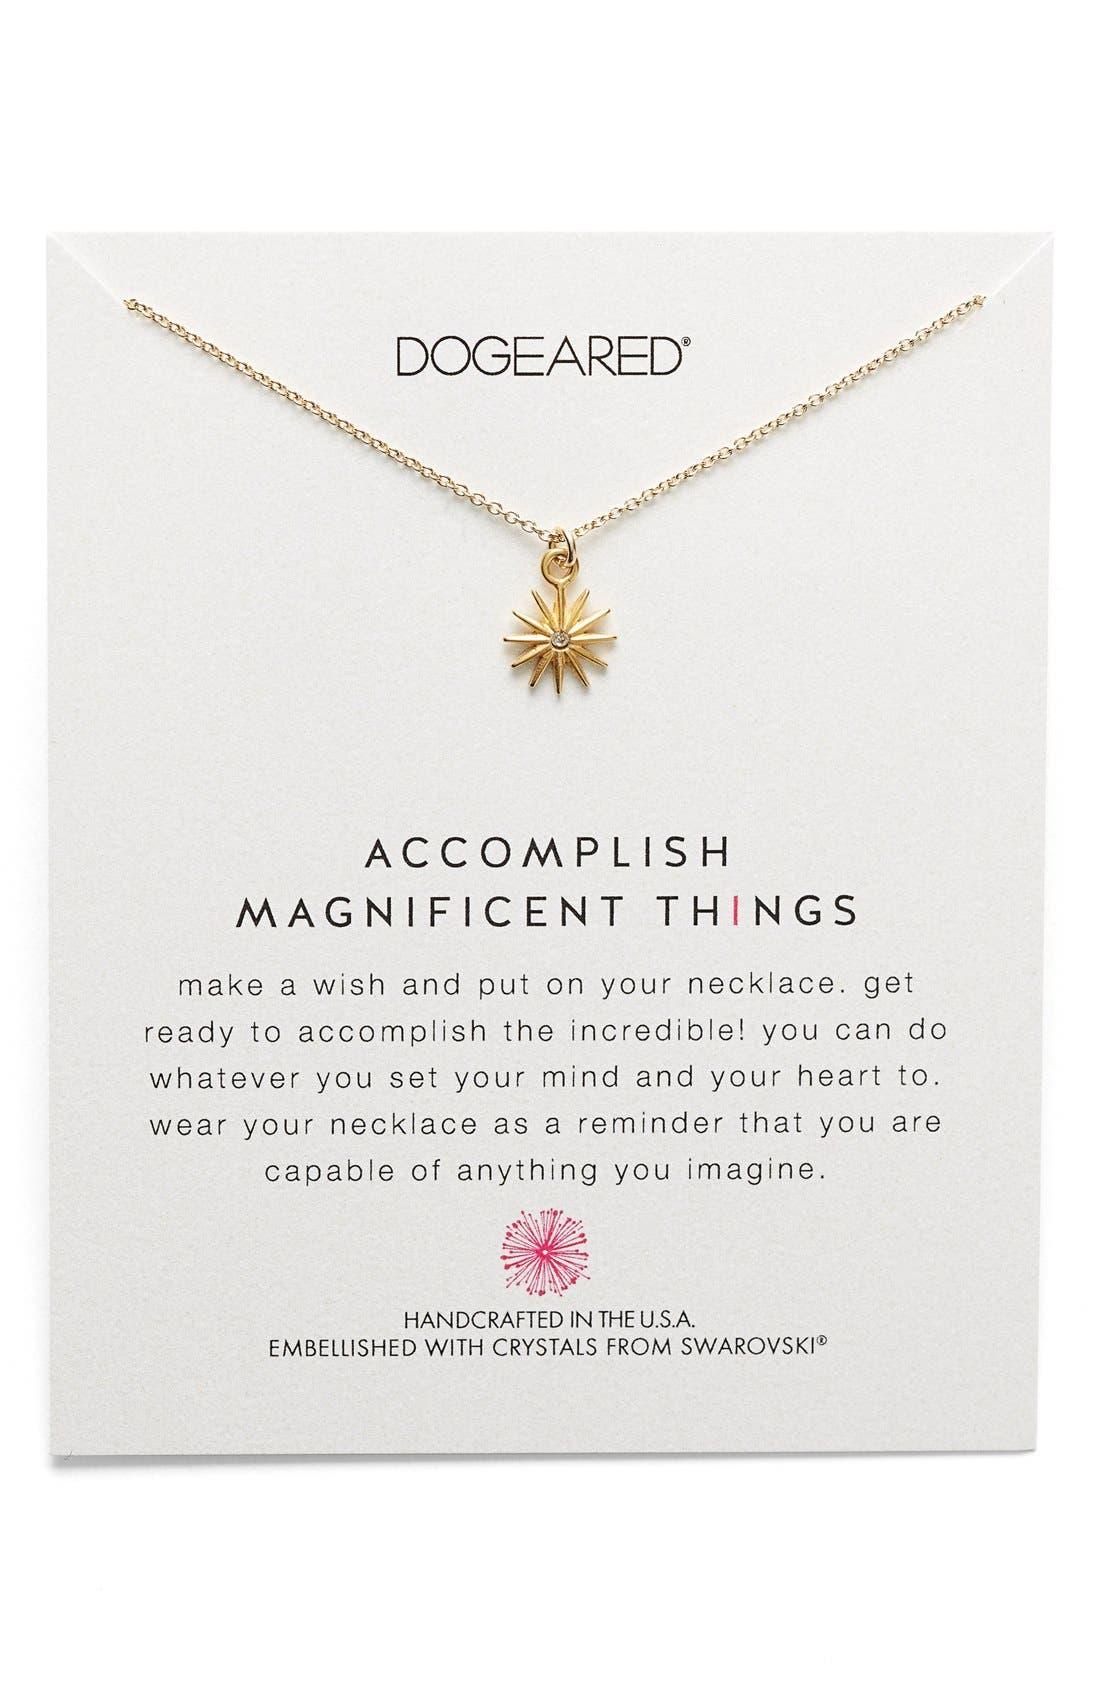 Alternate Image 1 Selected - Dogeared 'Swarovski Reminders' Pendant Necklace